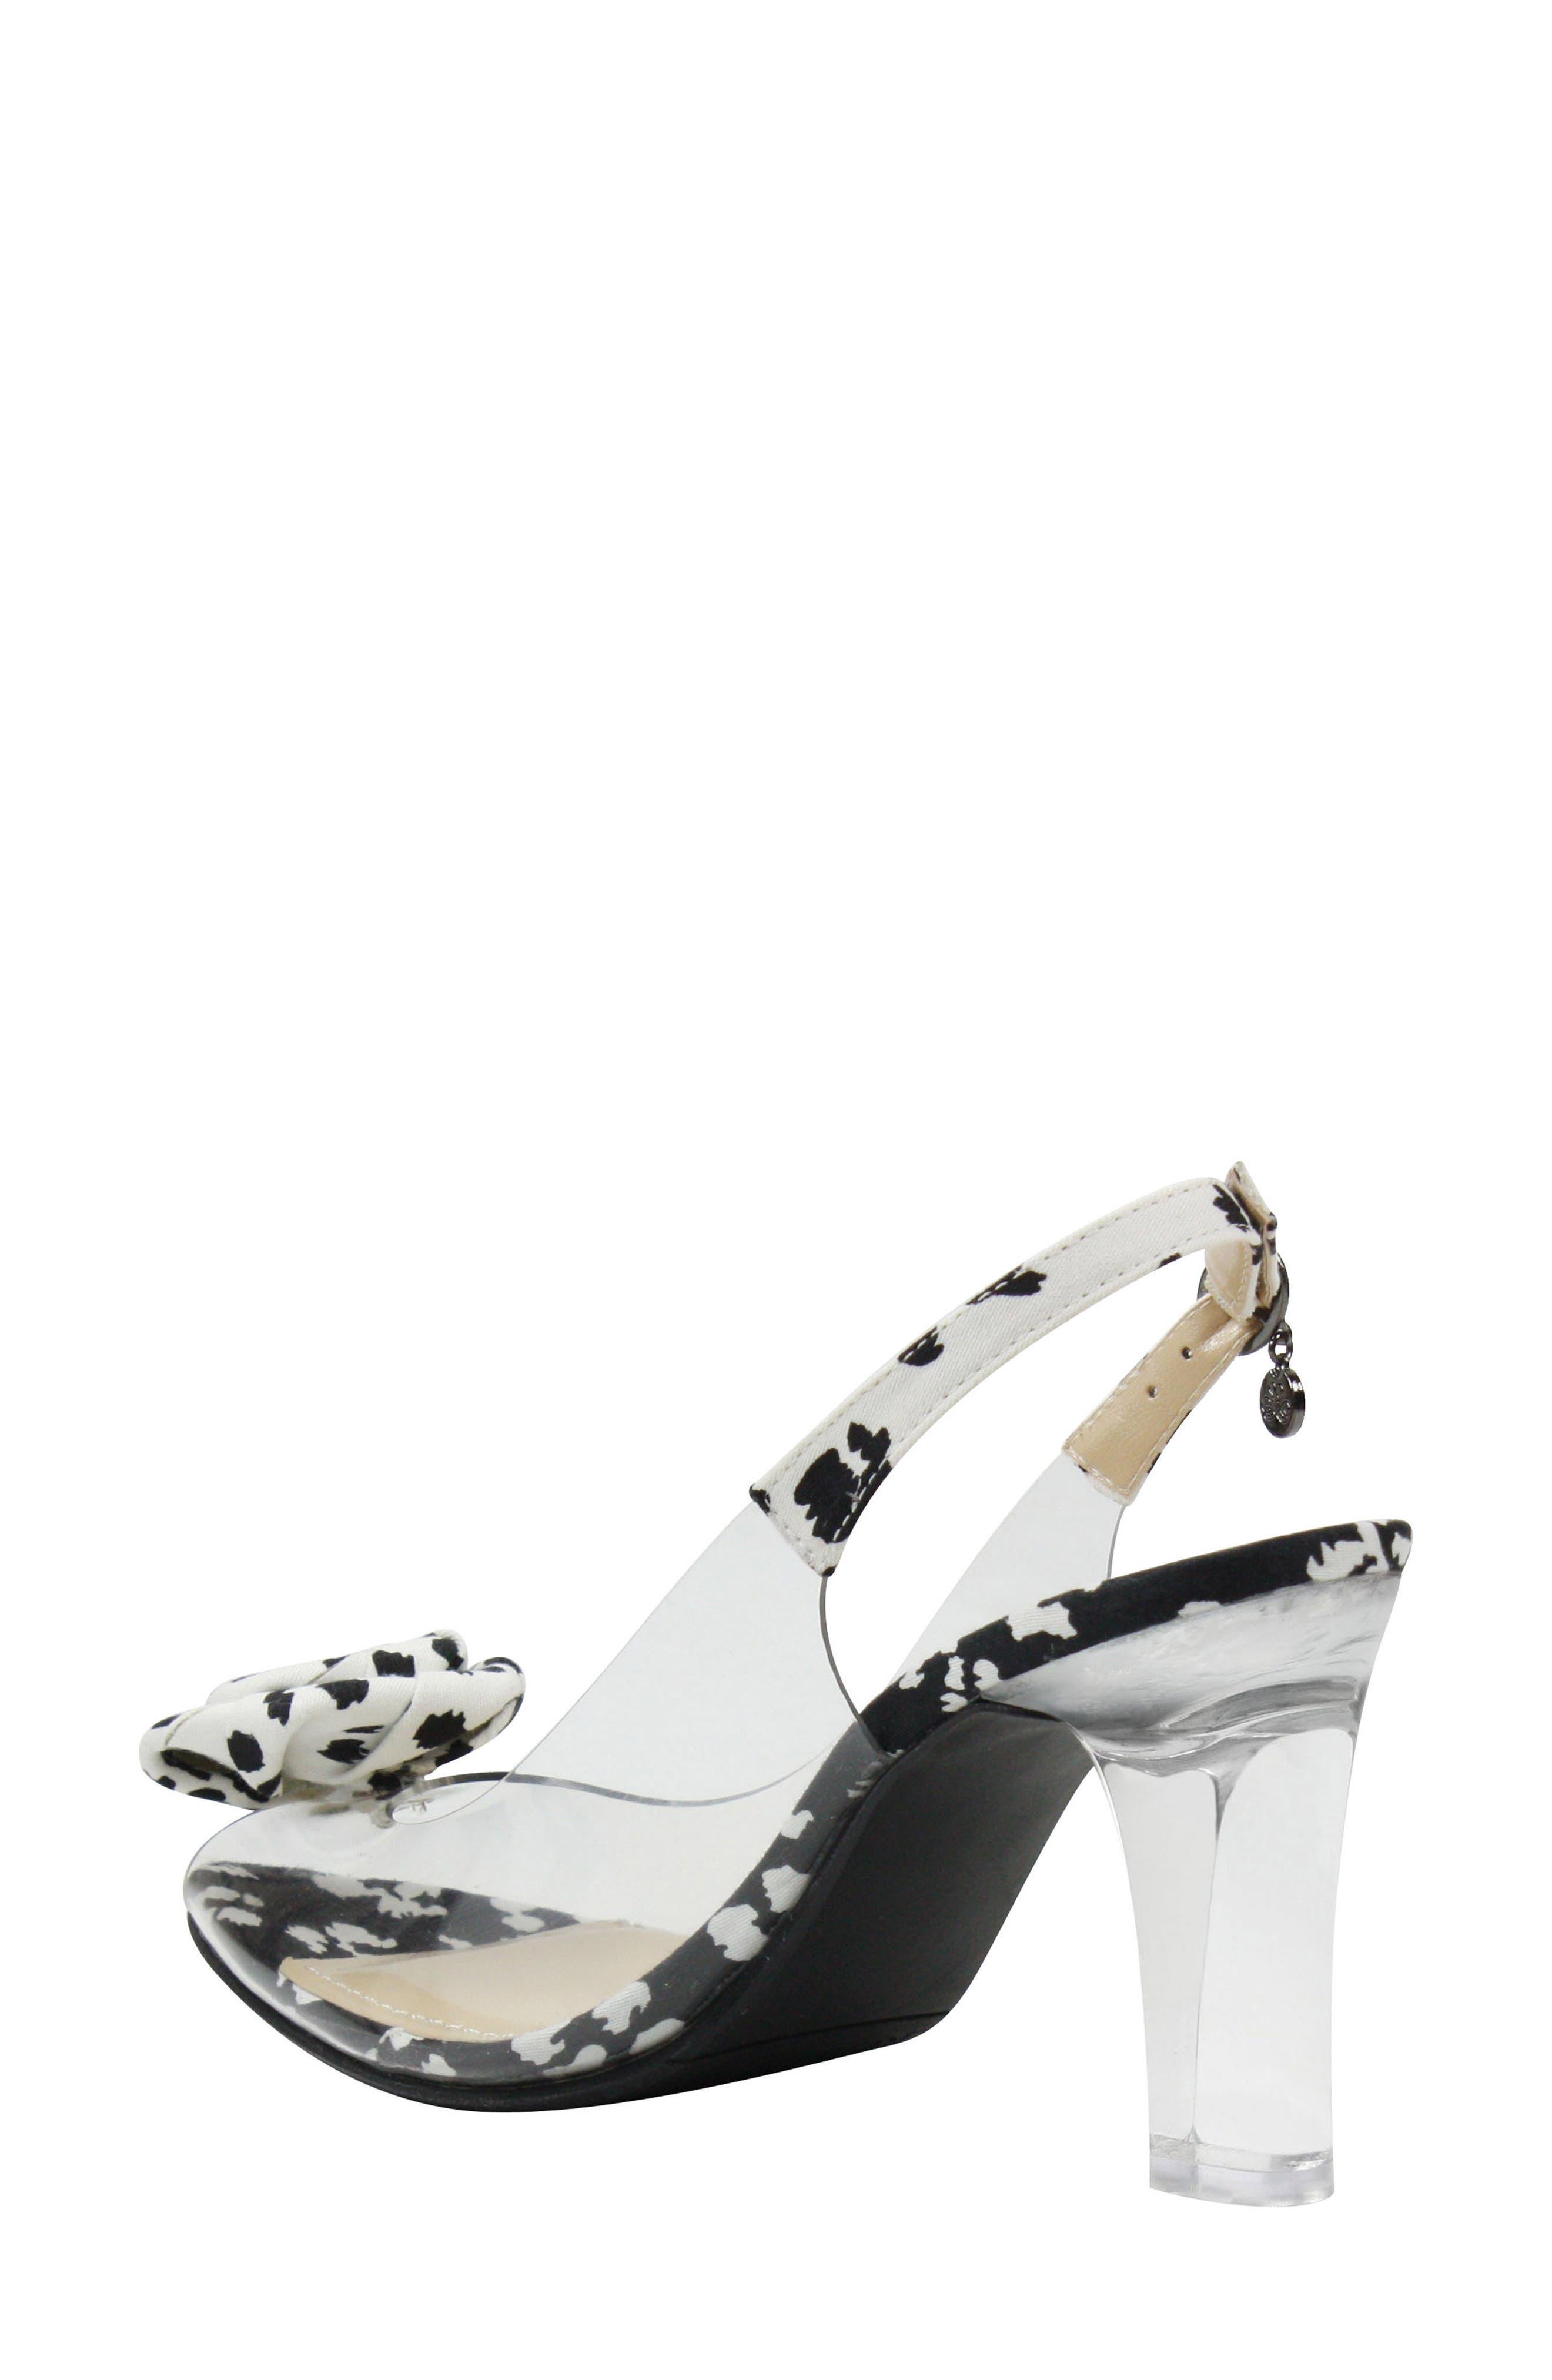 Adoracion Slingback Sandal,                             Alternate thumbnail 2, color,                             CLEAR/ BLACK/ WHITE